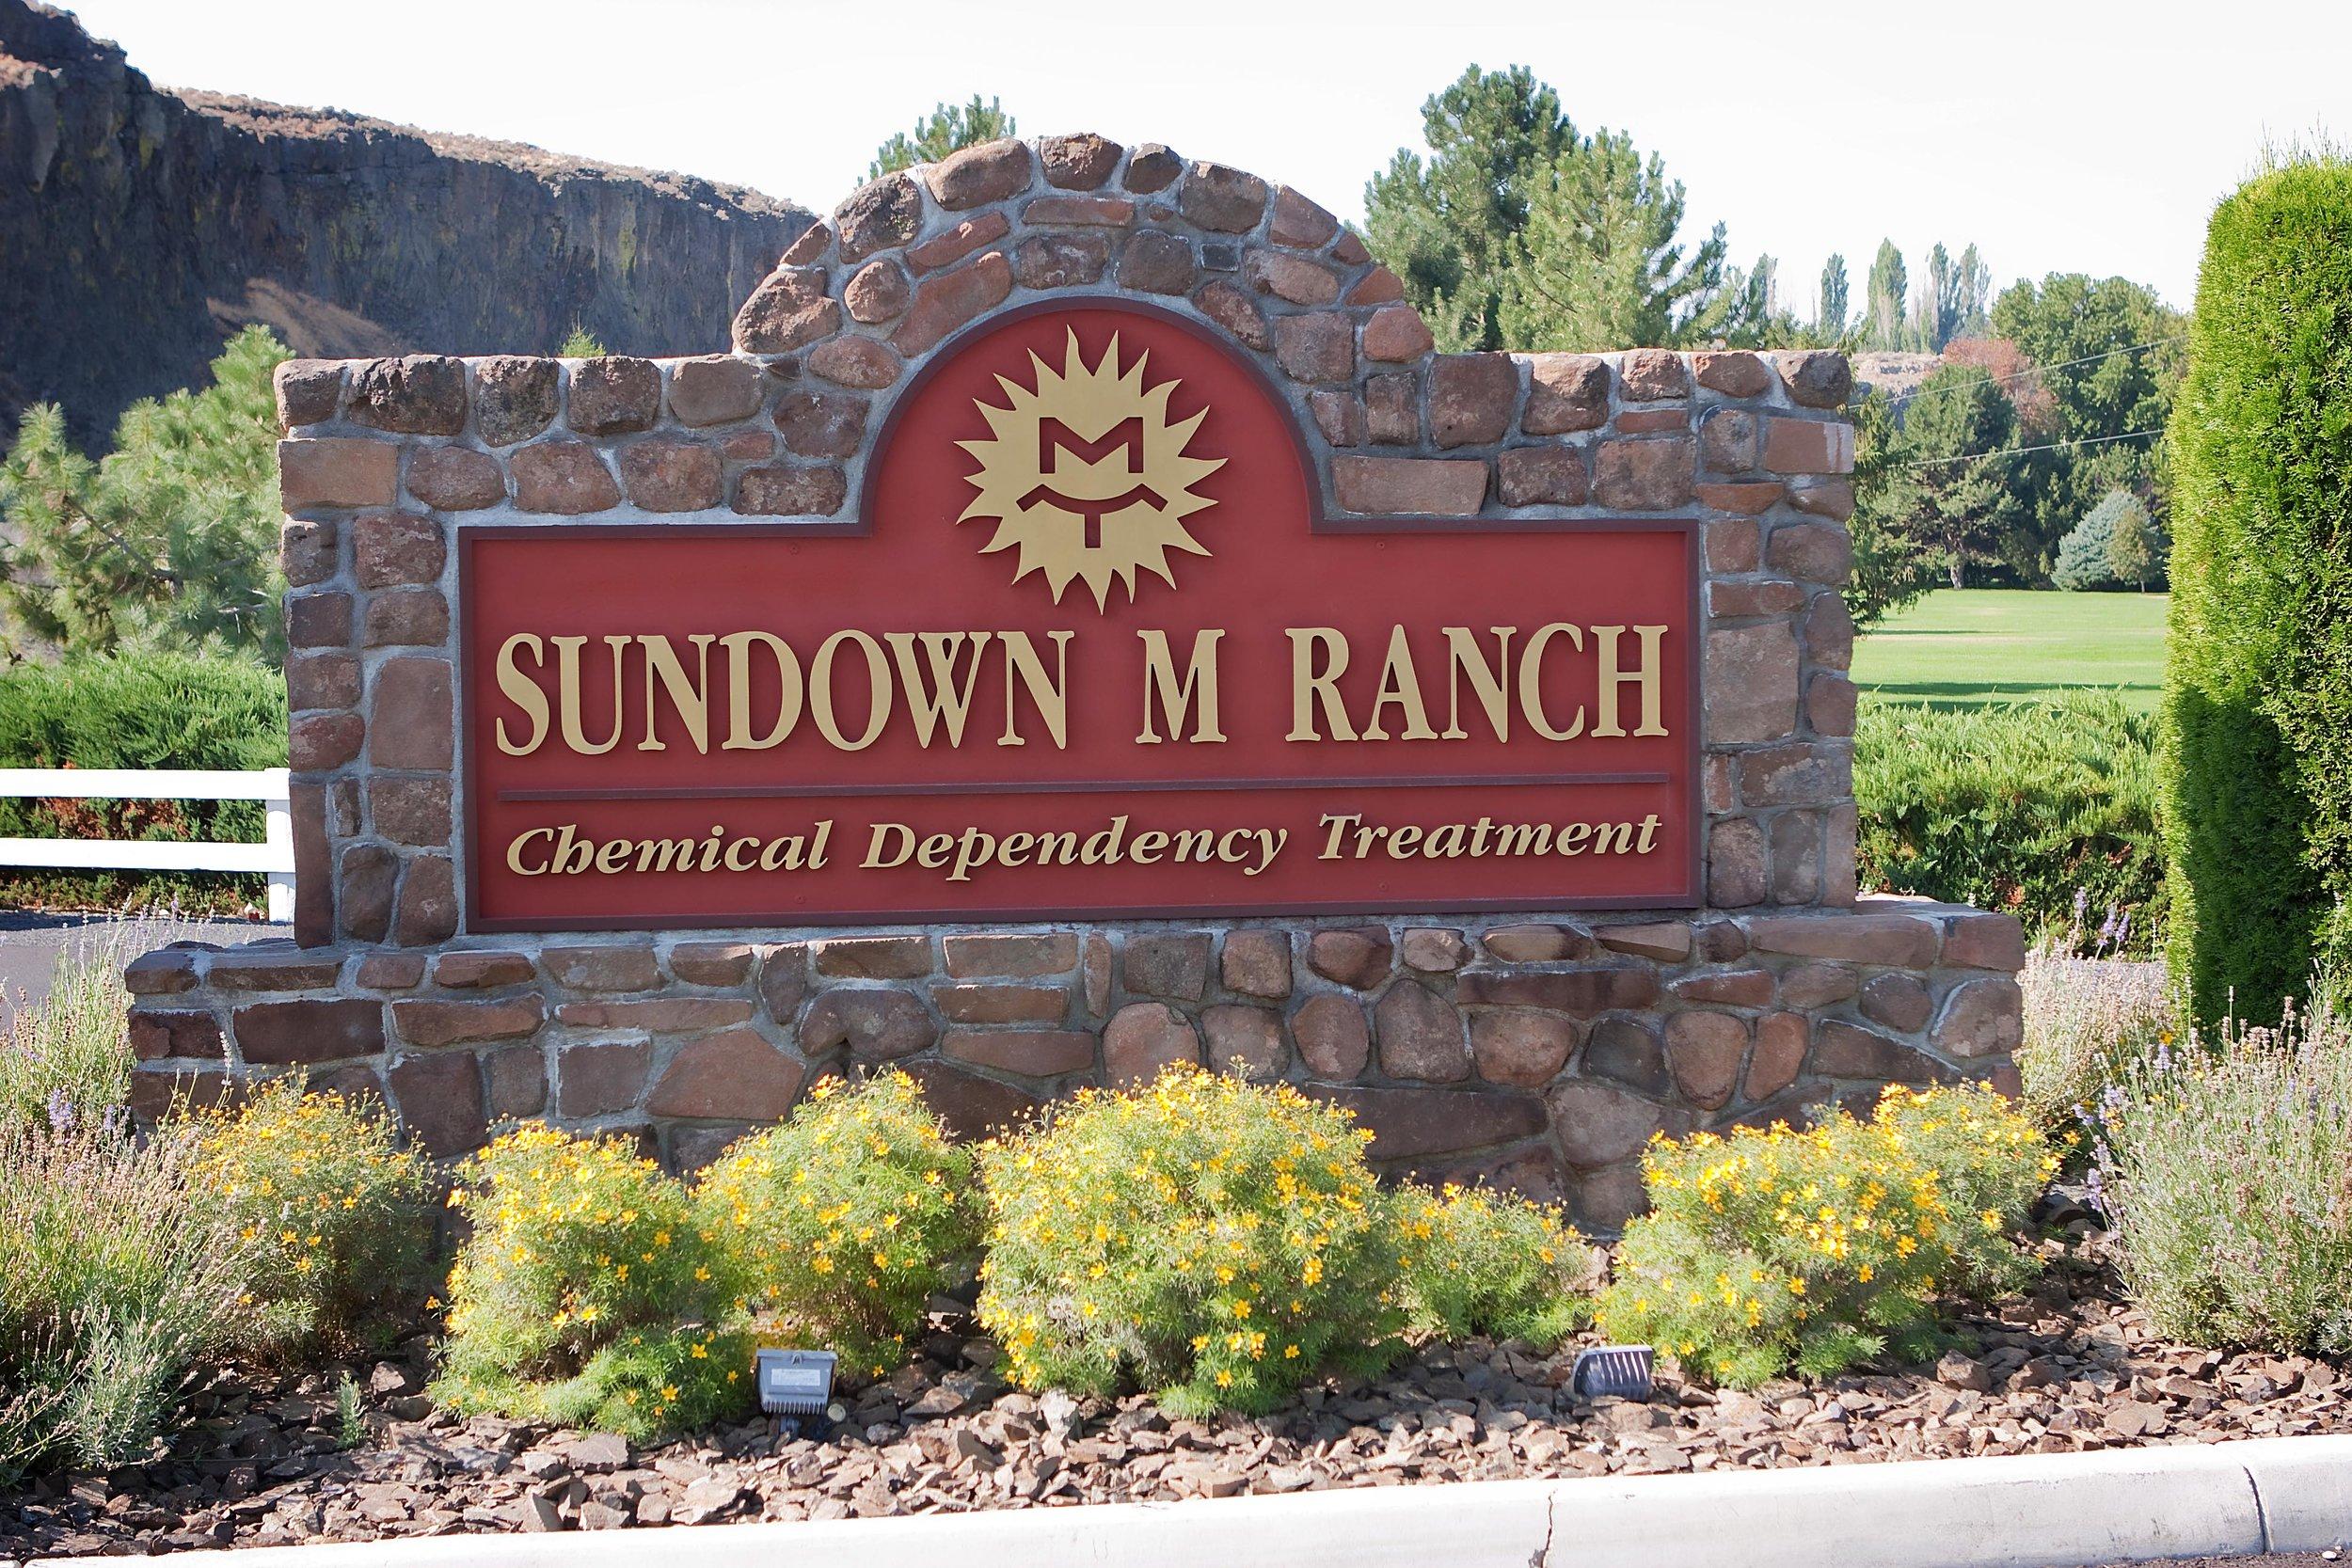 Image via  Sundown M Ranch